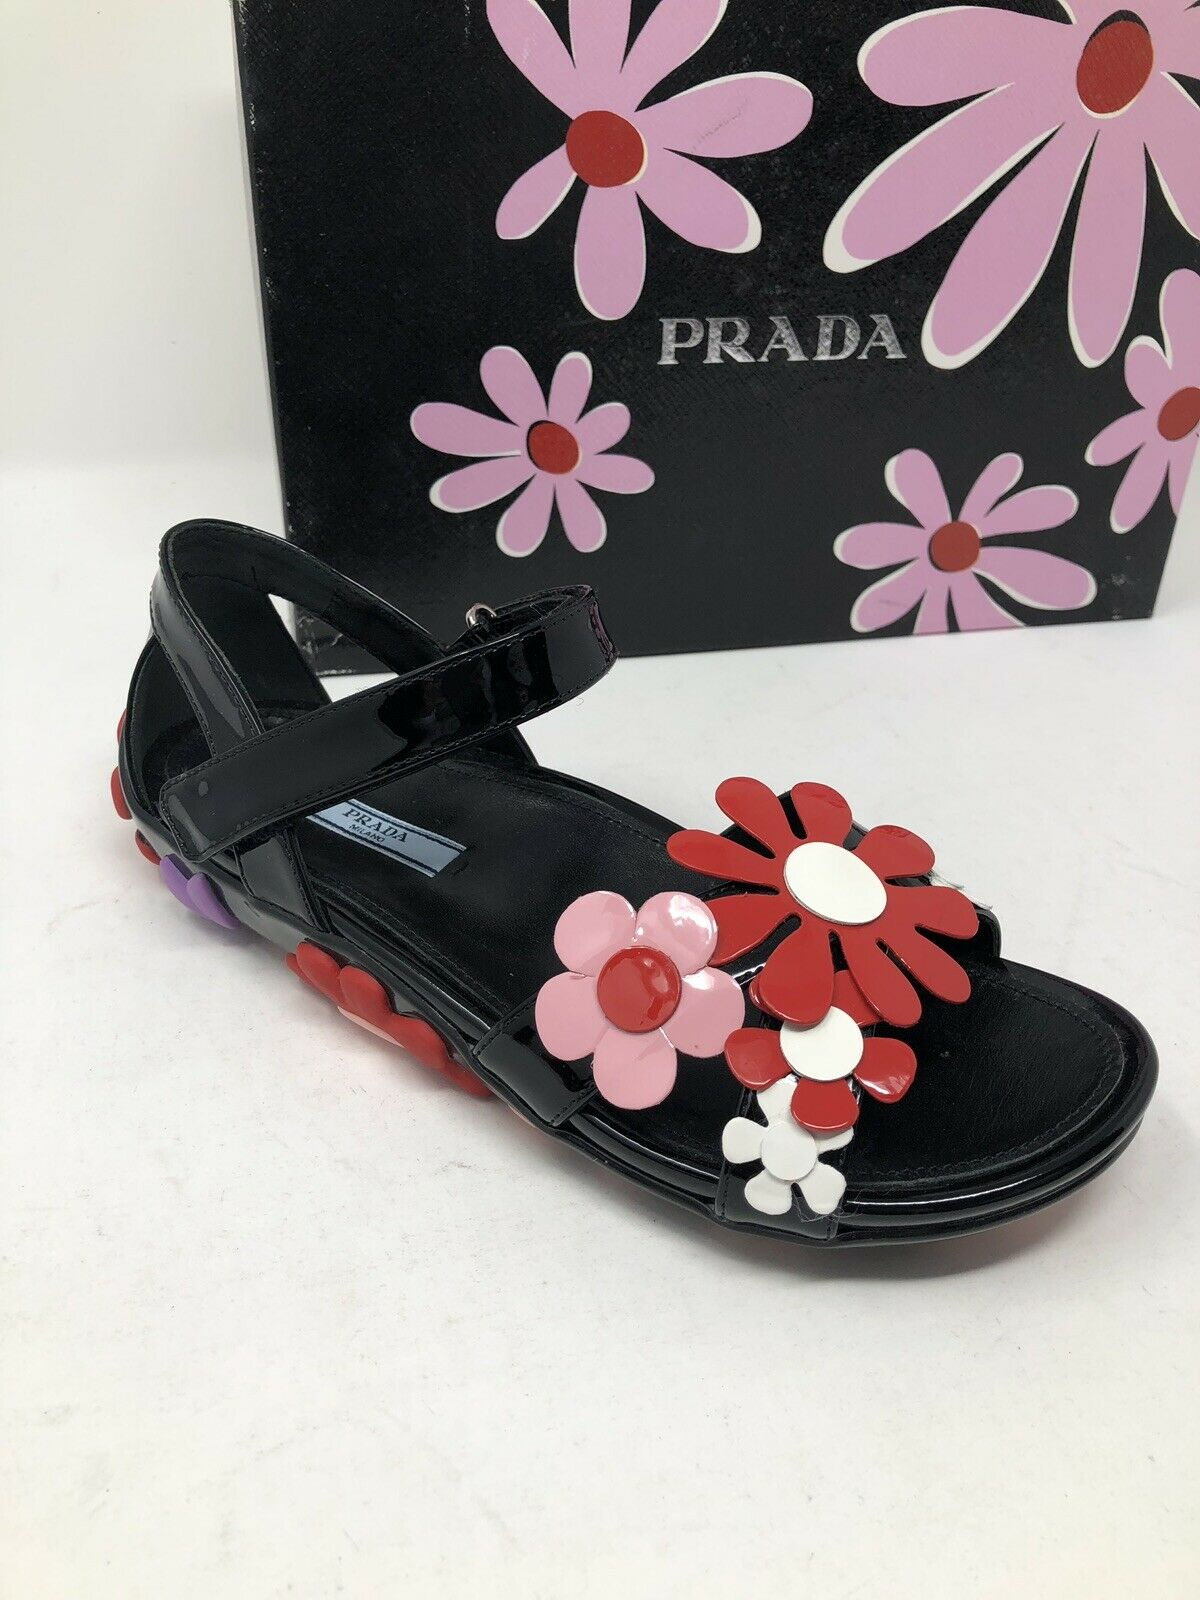 620 New PRADA Womens Black shoes Ladies Flower Sandals Size 6 US 36 EU